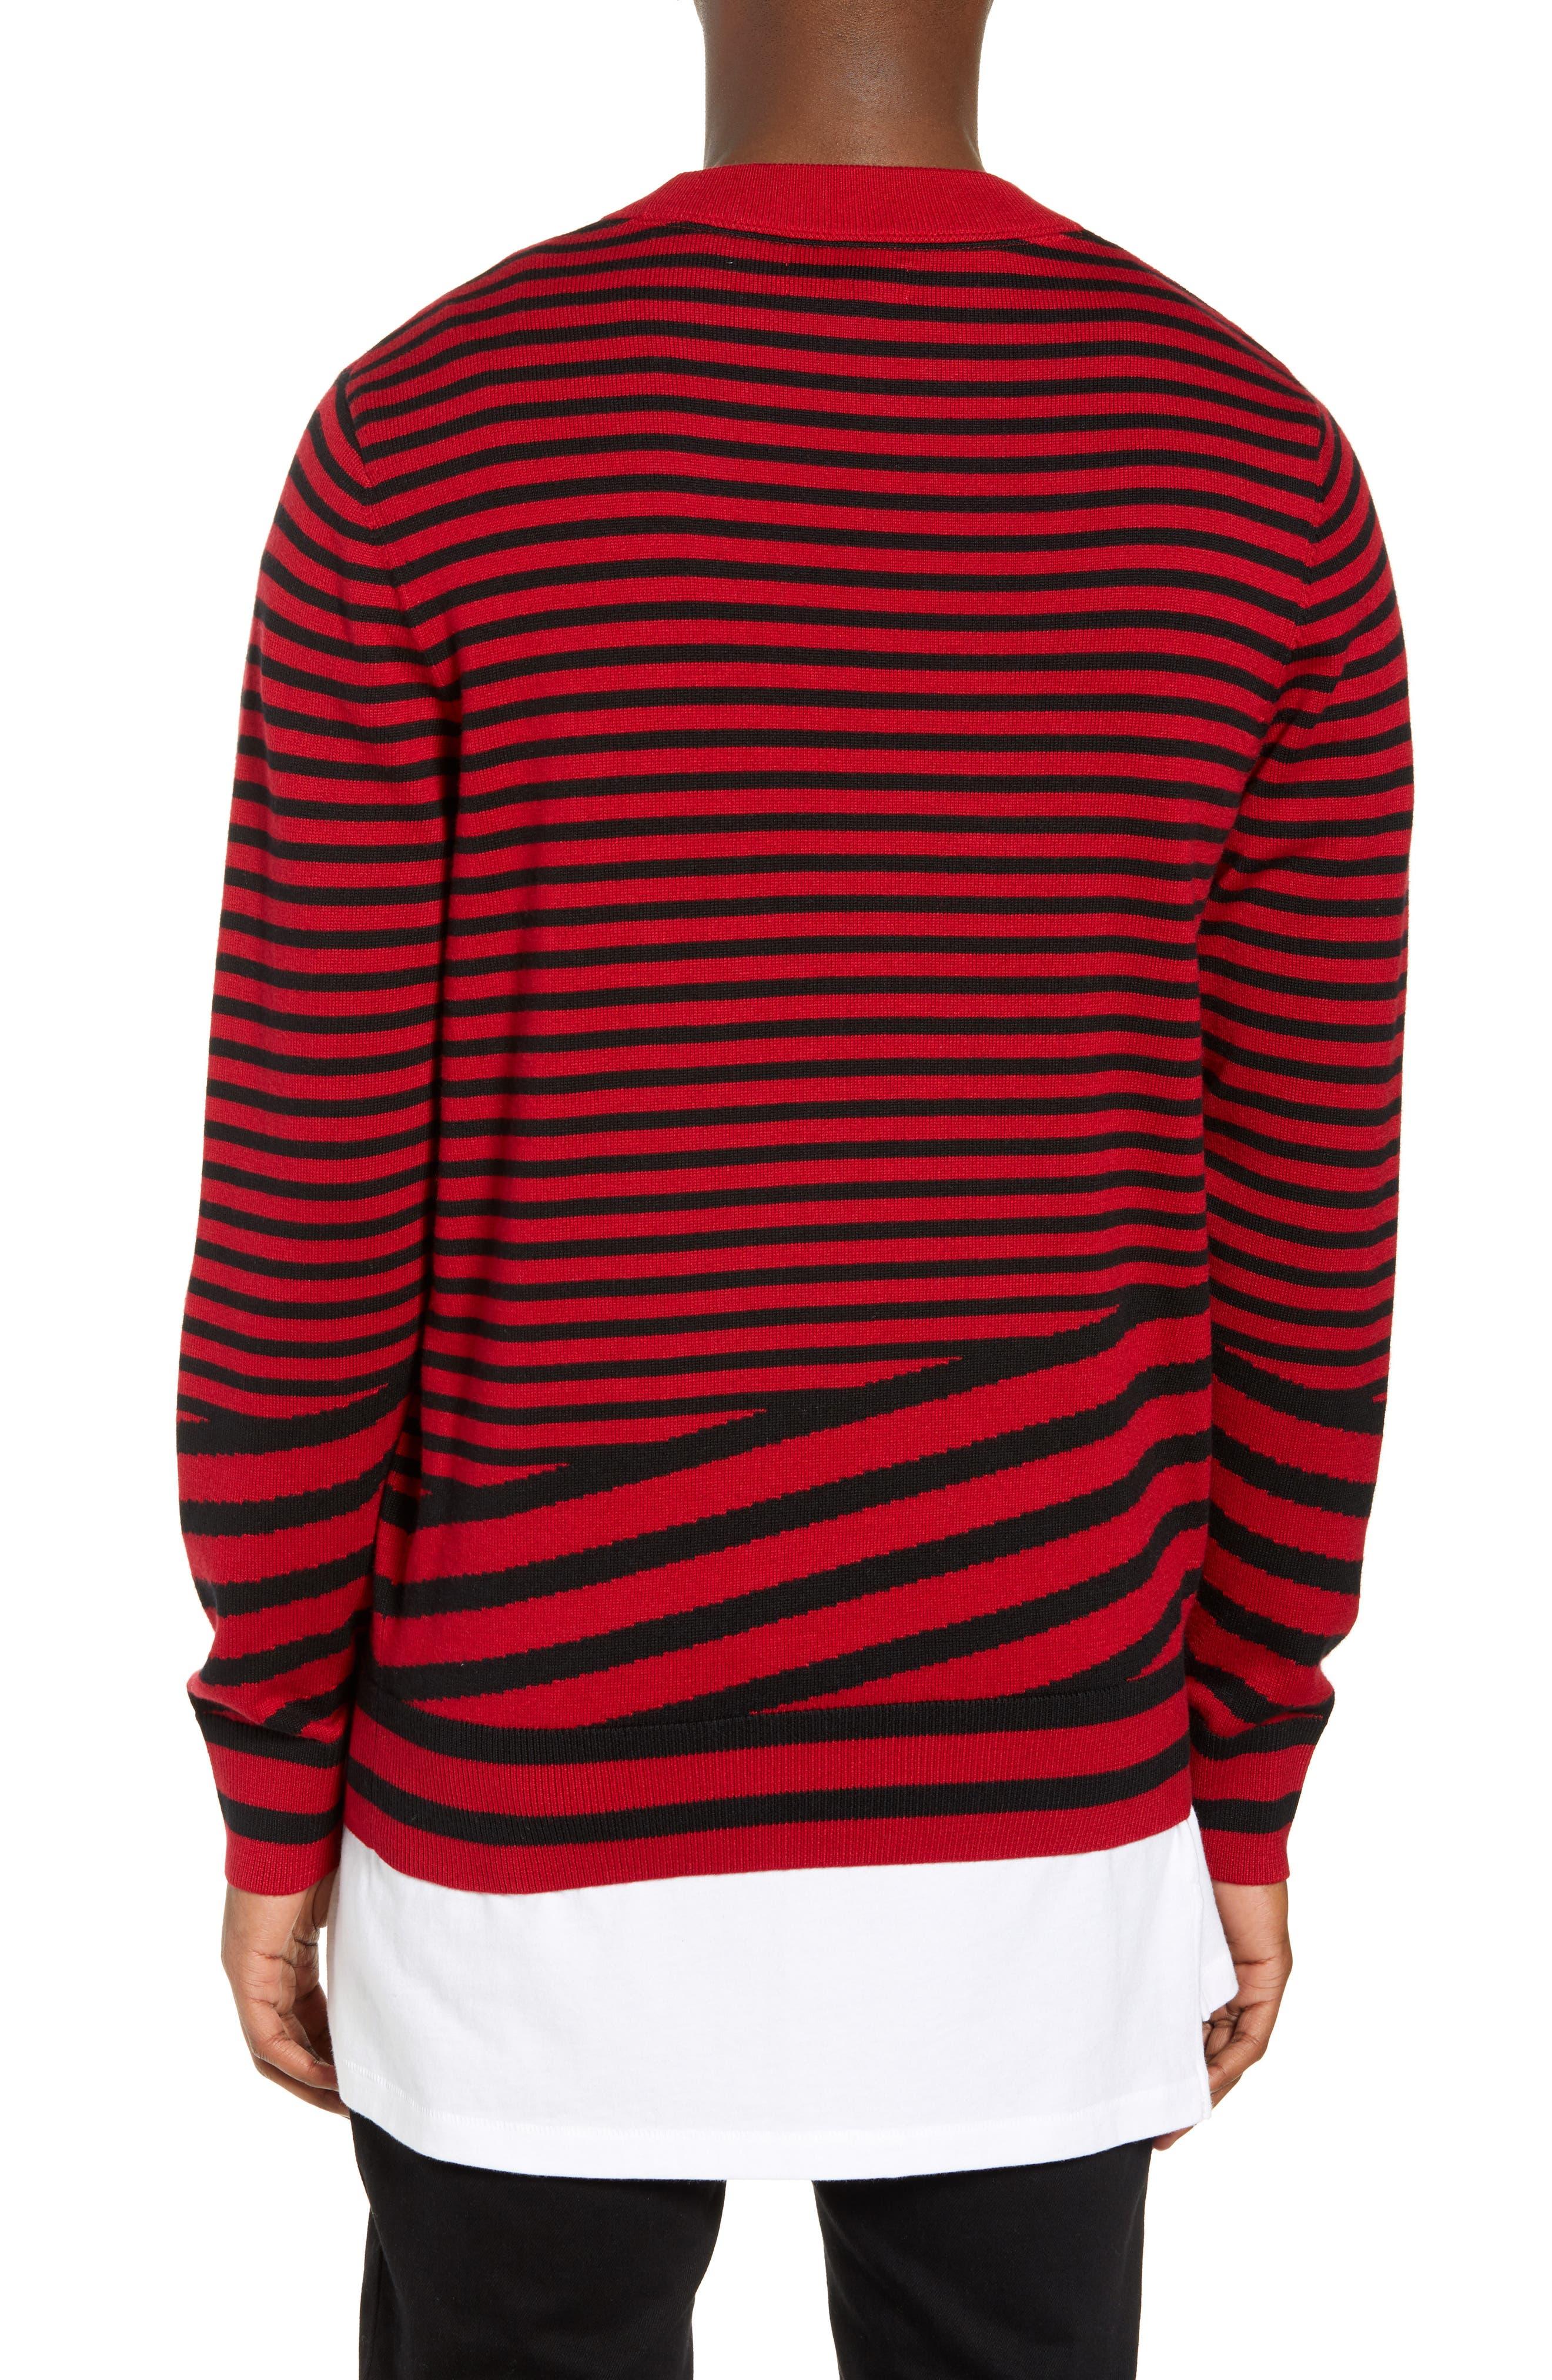 Asymmetrical Stripe Longline Sweater,                             Alternate thumbnail 2, color,                             RED BLACK RETRO STRIPE